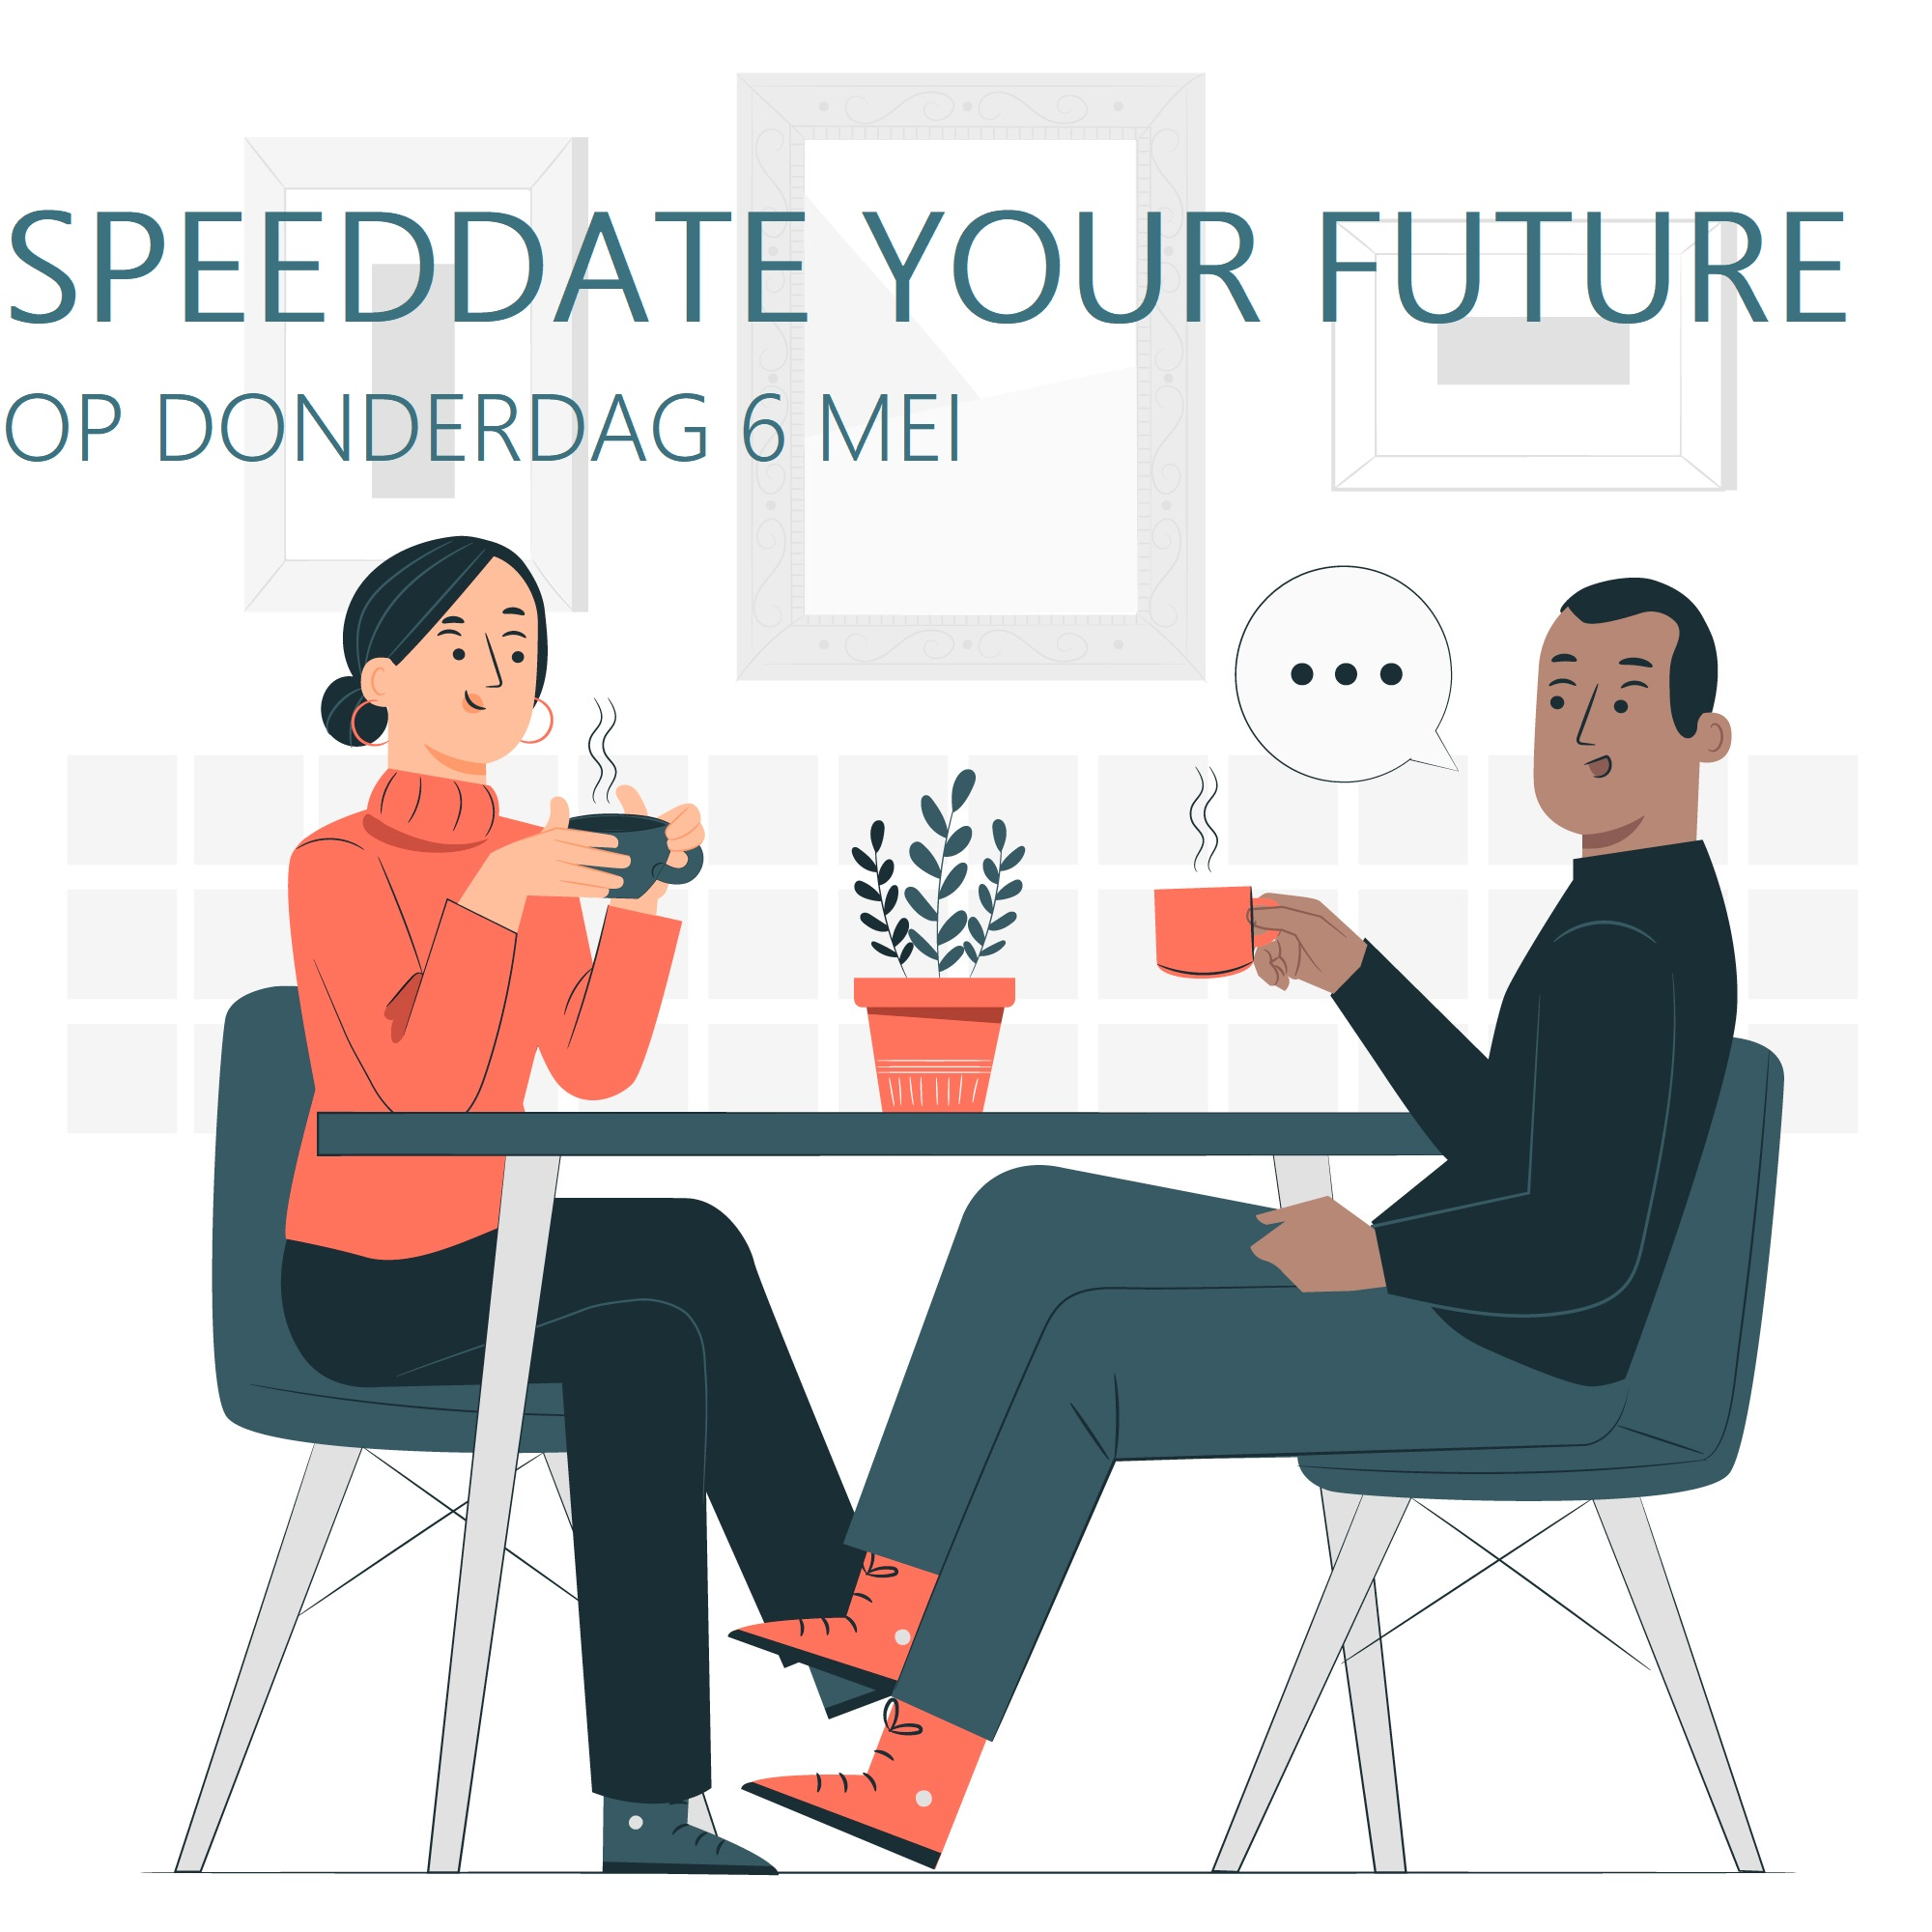 Speeddate Your Future